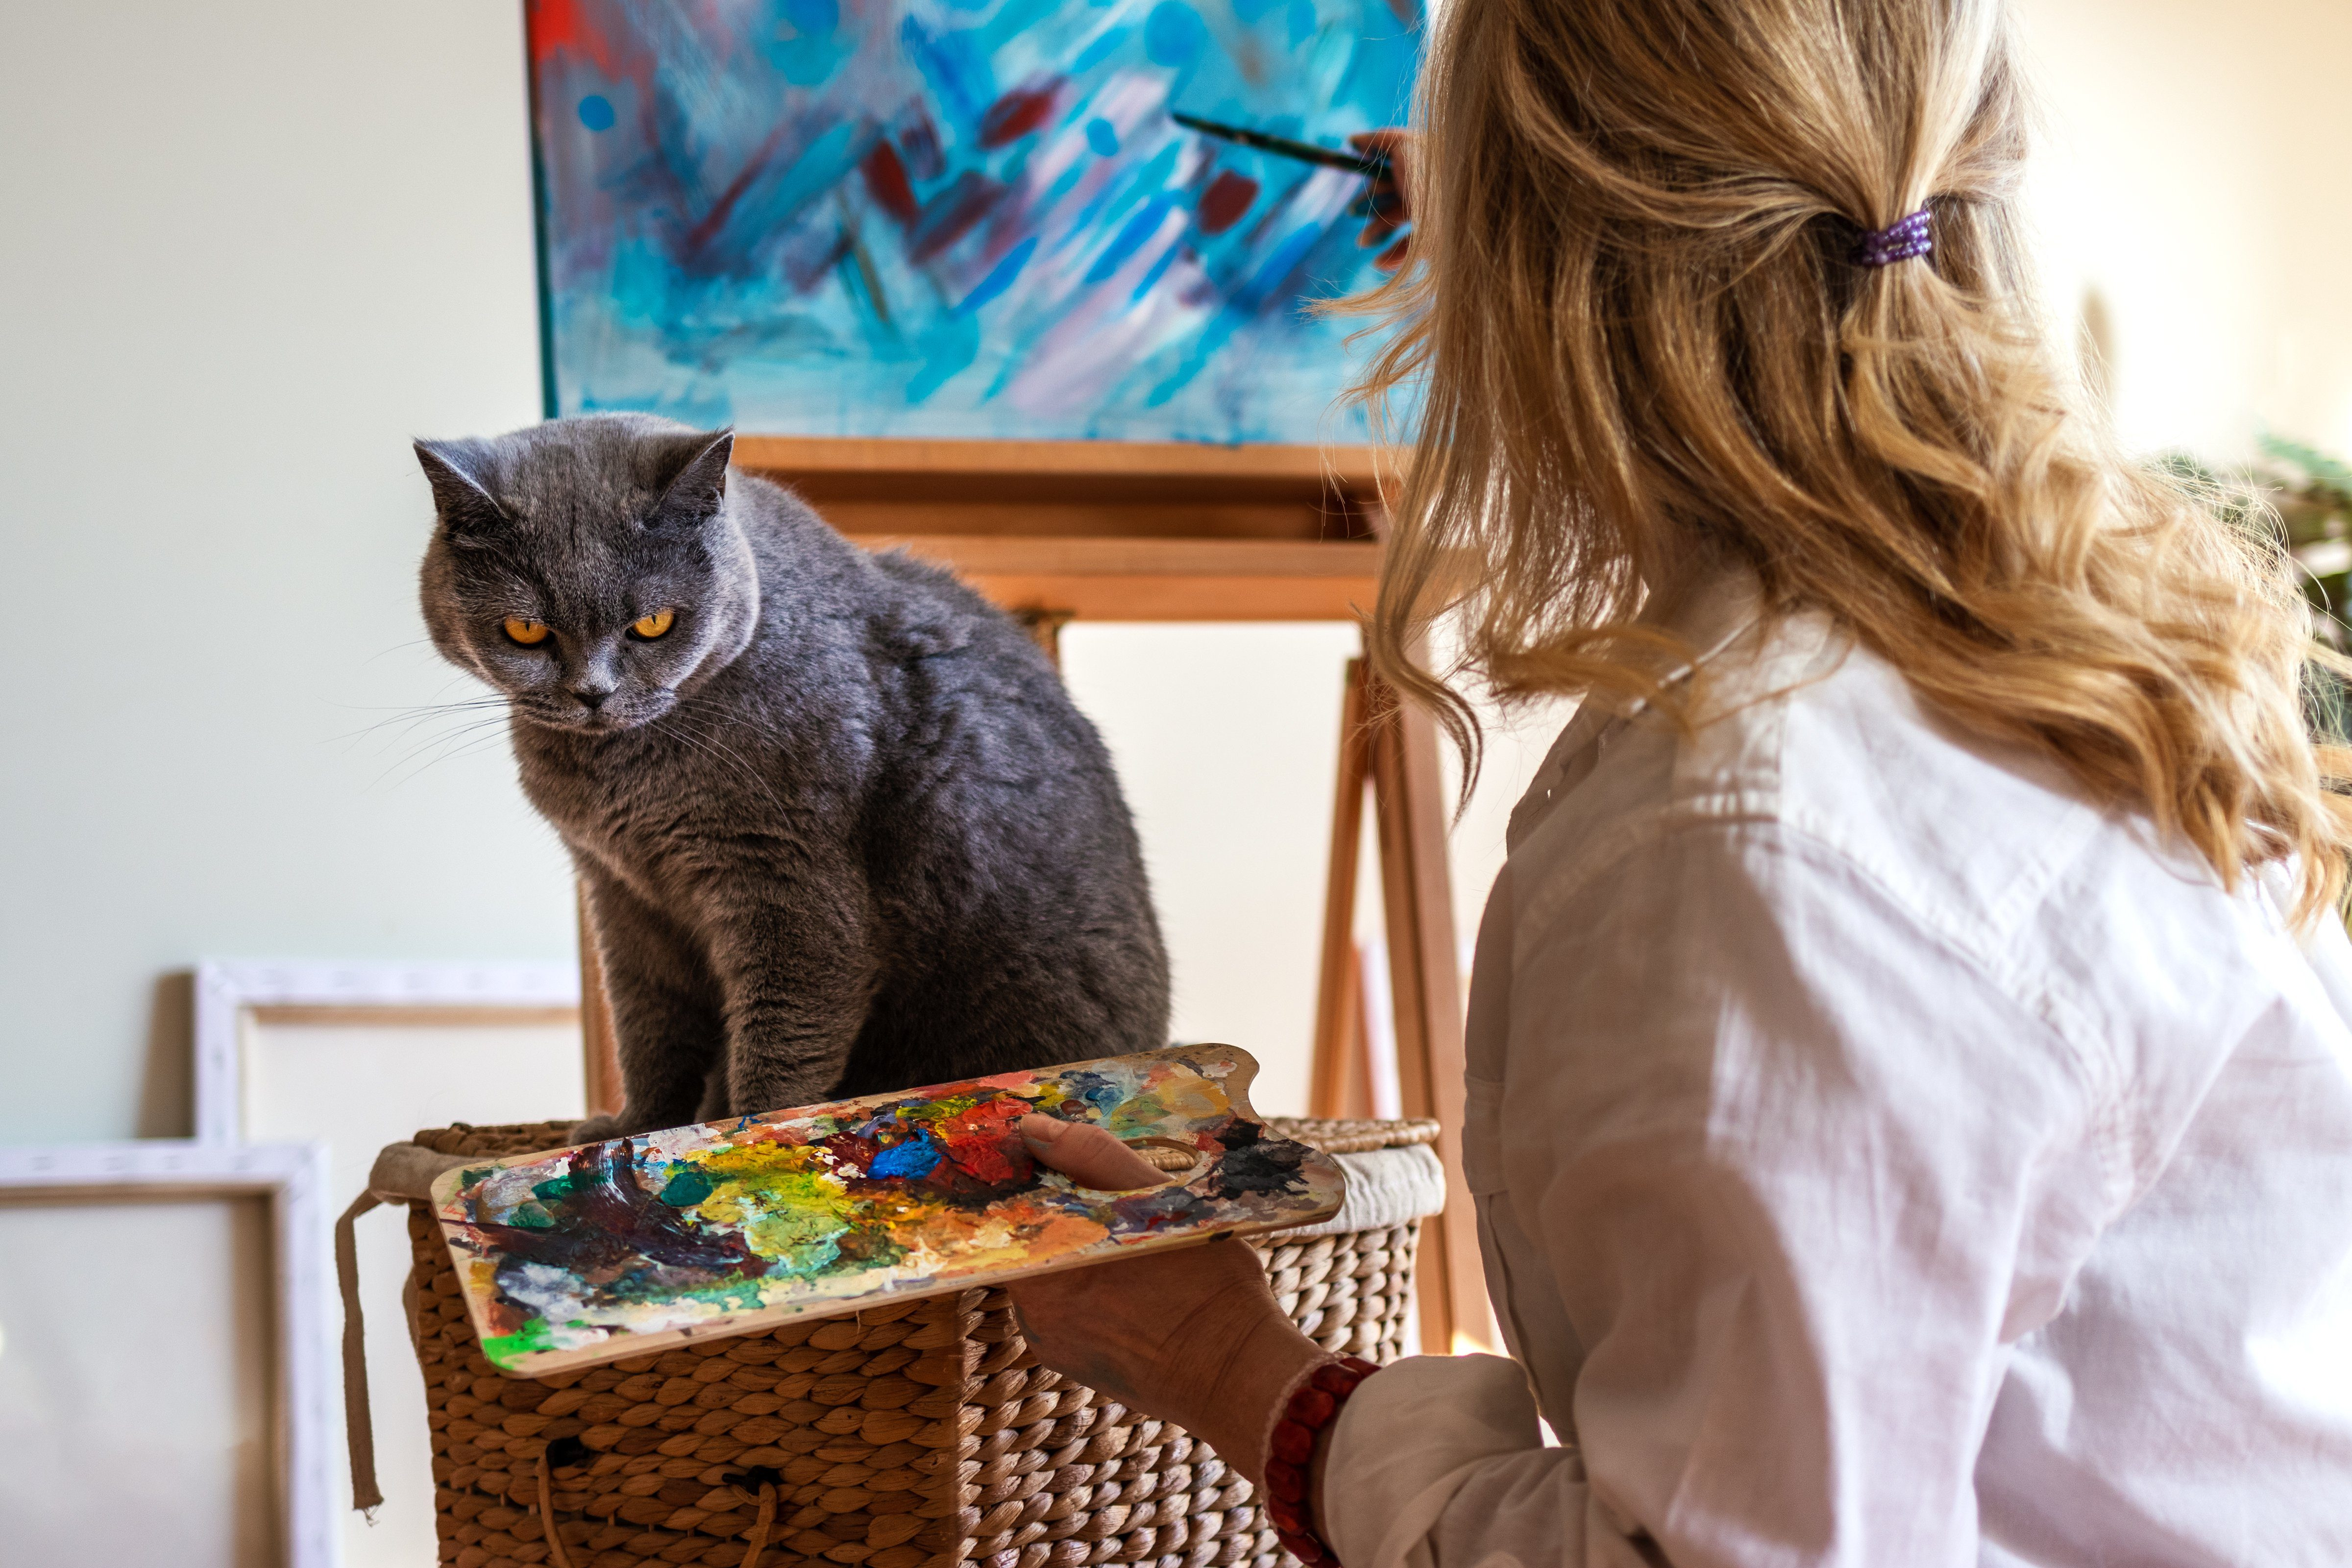 Artist enjoying painting with her british shorthair cat